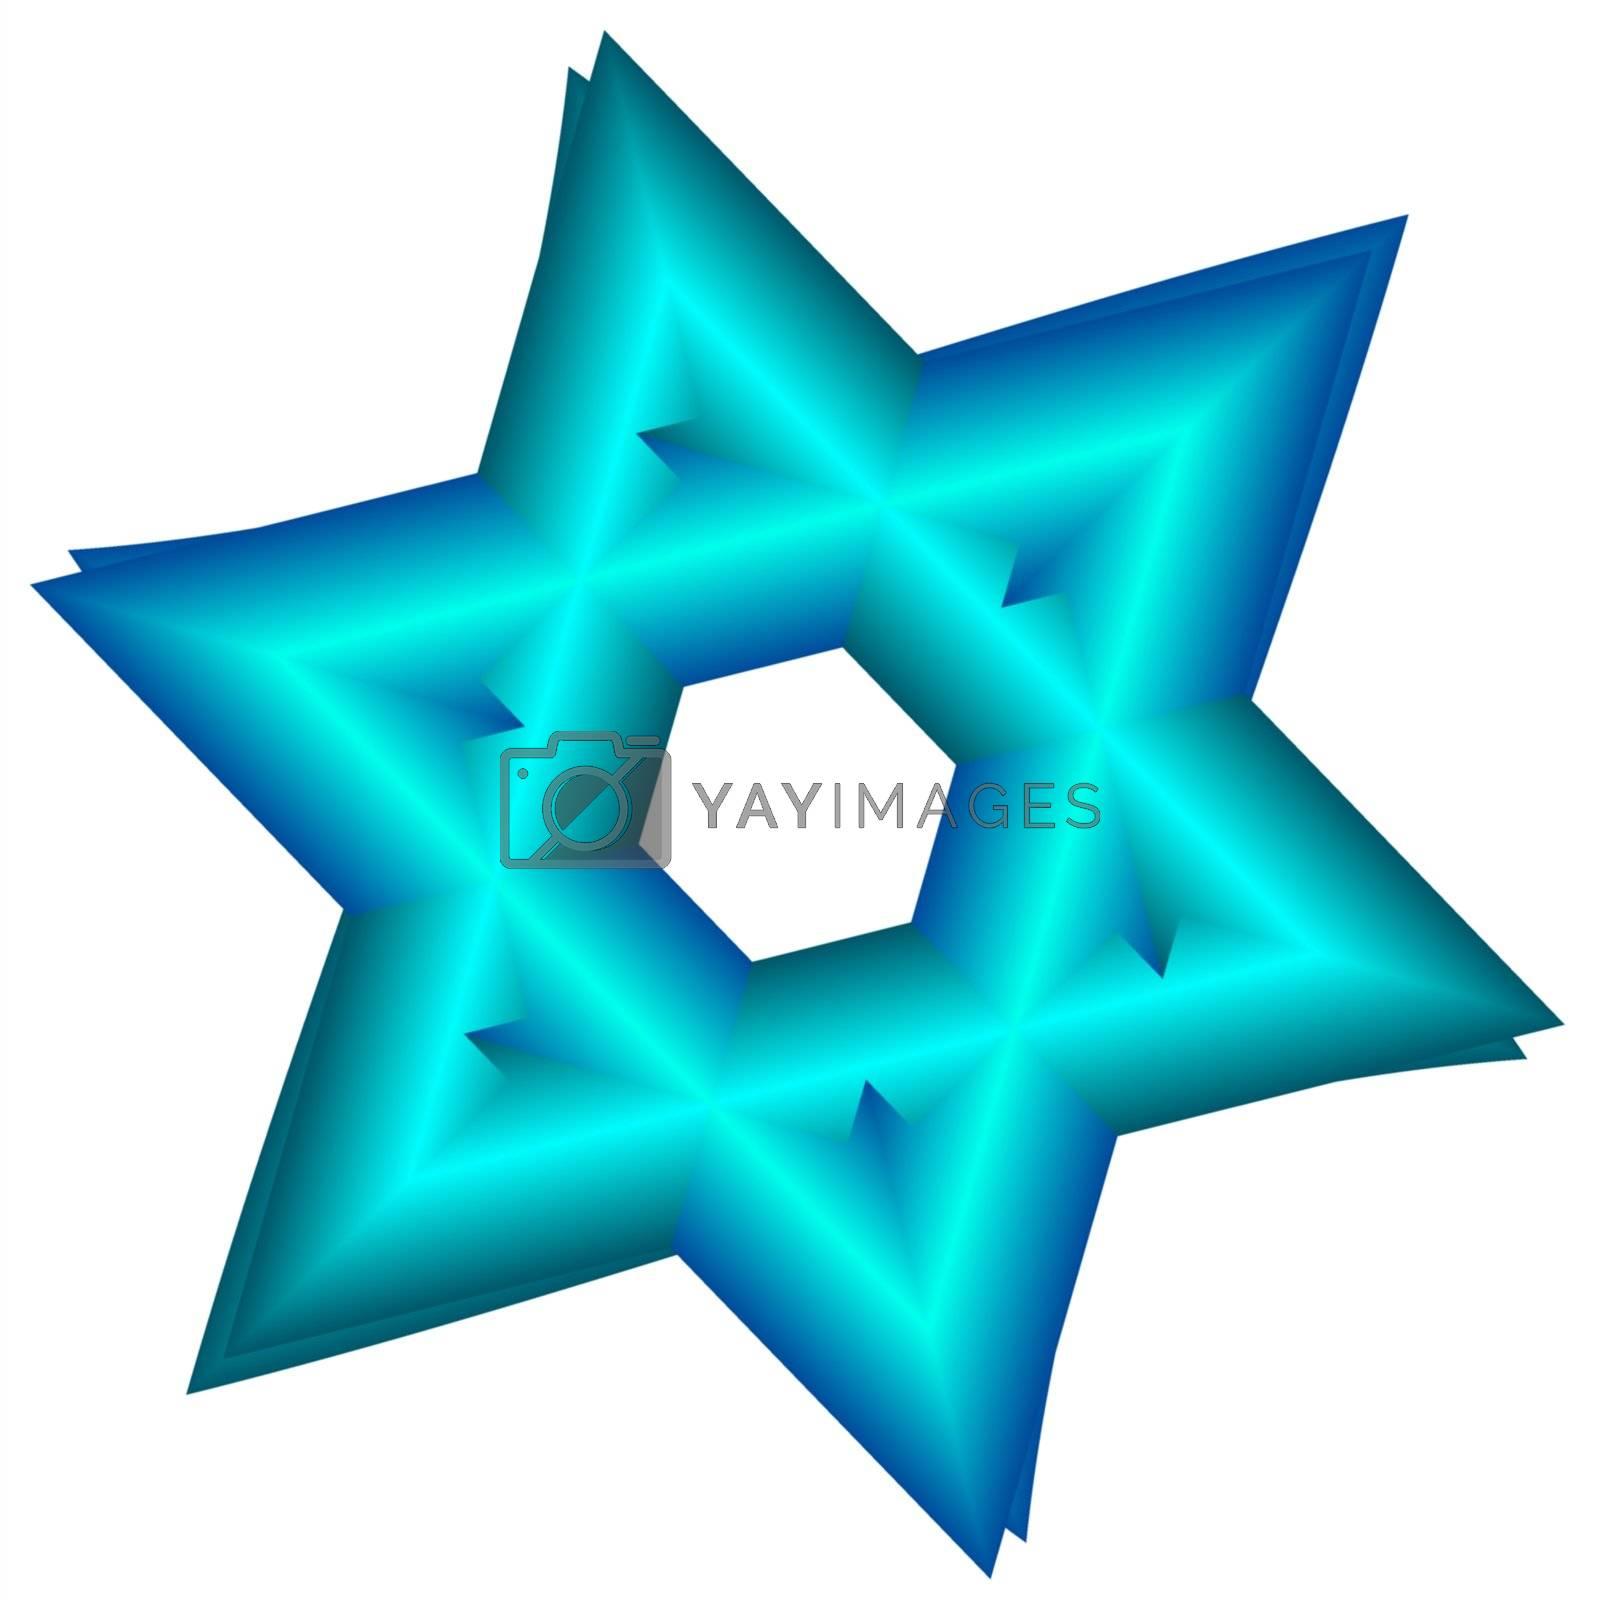 blue star of David, fractal generated